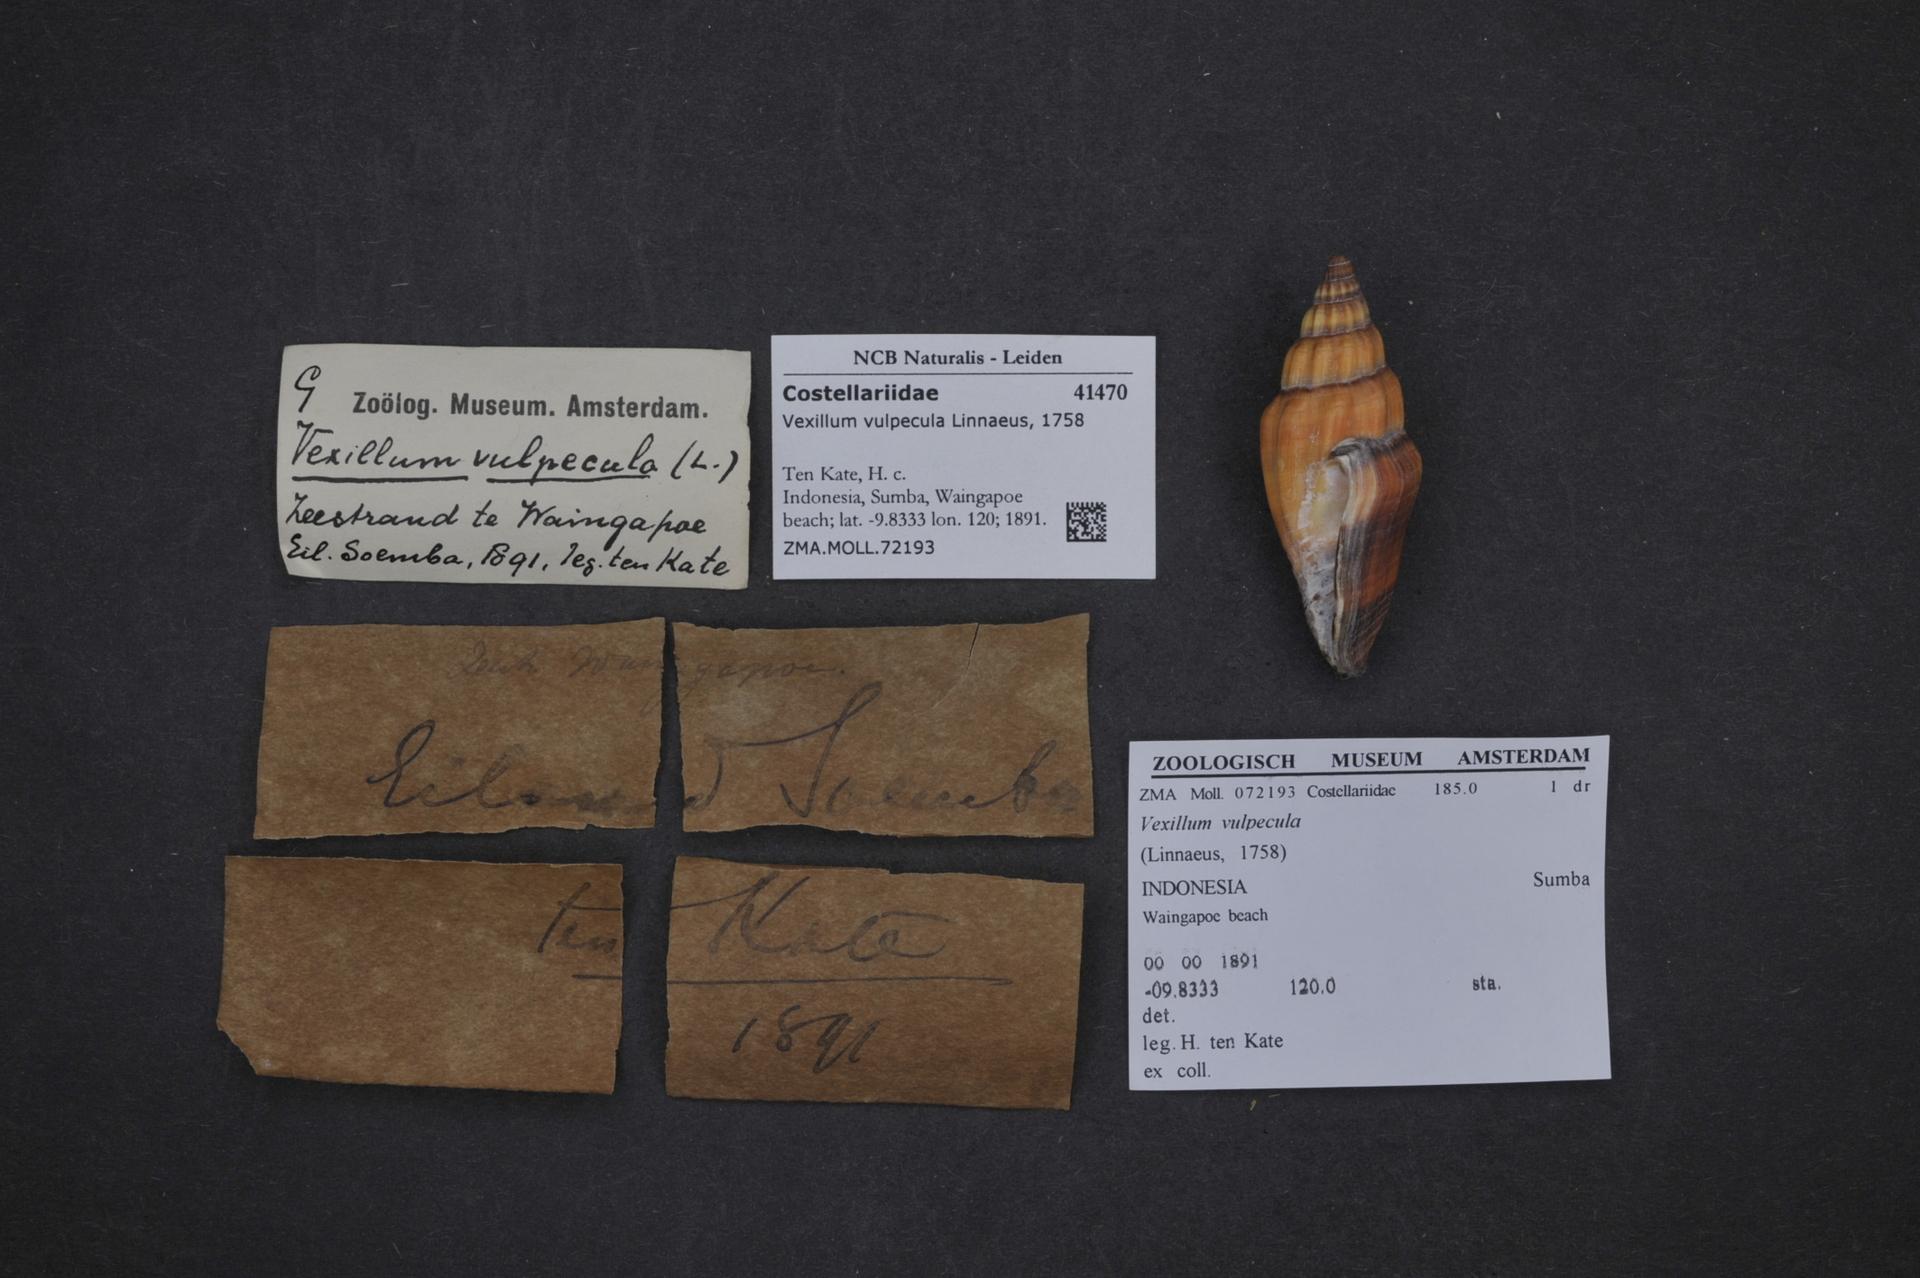 ZMA.MOLL.72193   Vexillum vulpecula (Linnaeus, 1758)